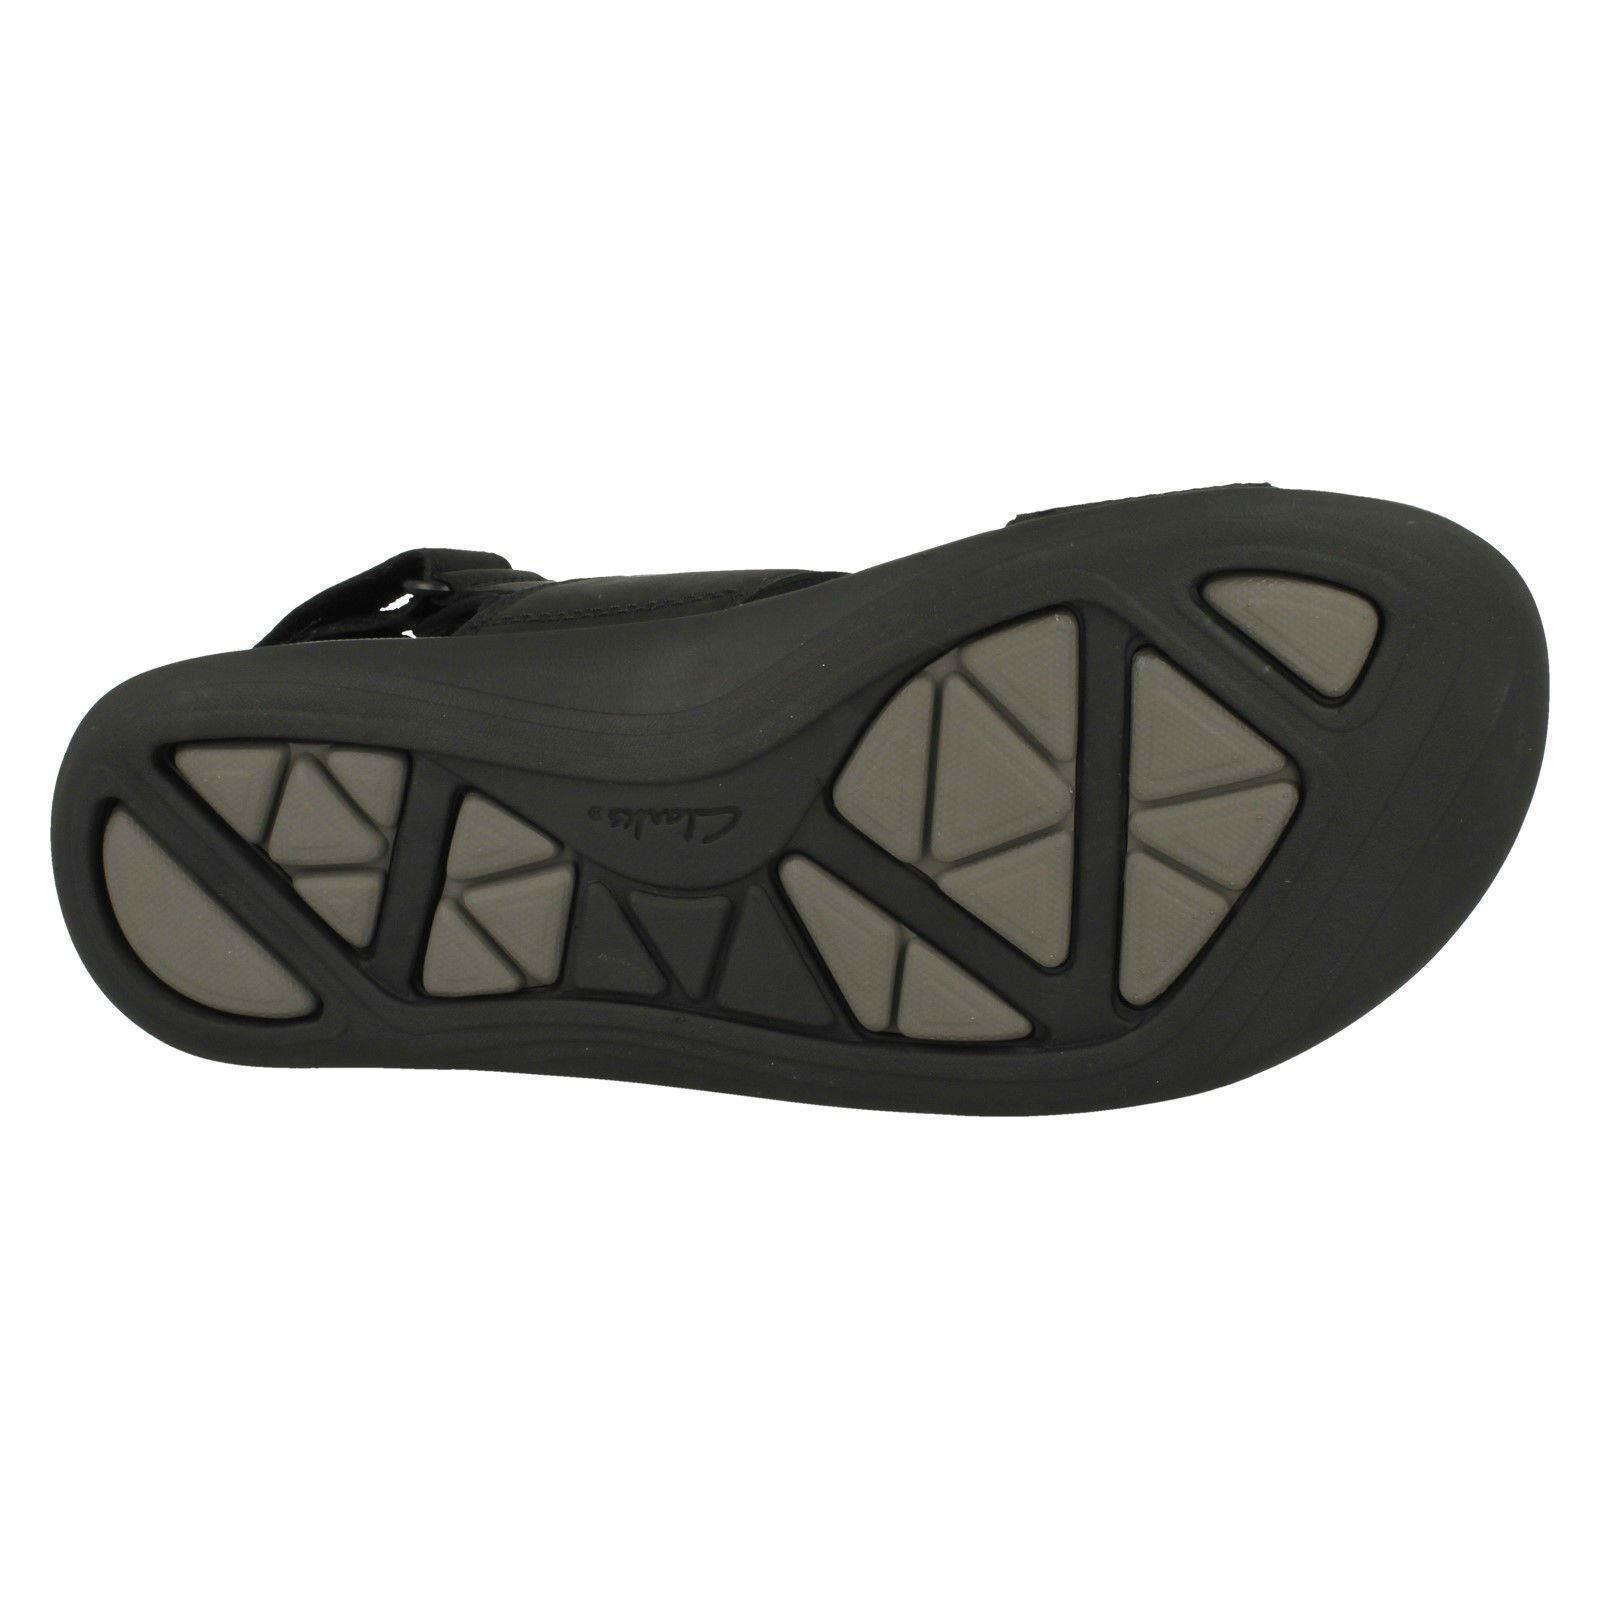 Mens Clarks Strapped Sandals 'Garratt Active'